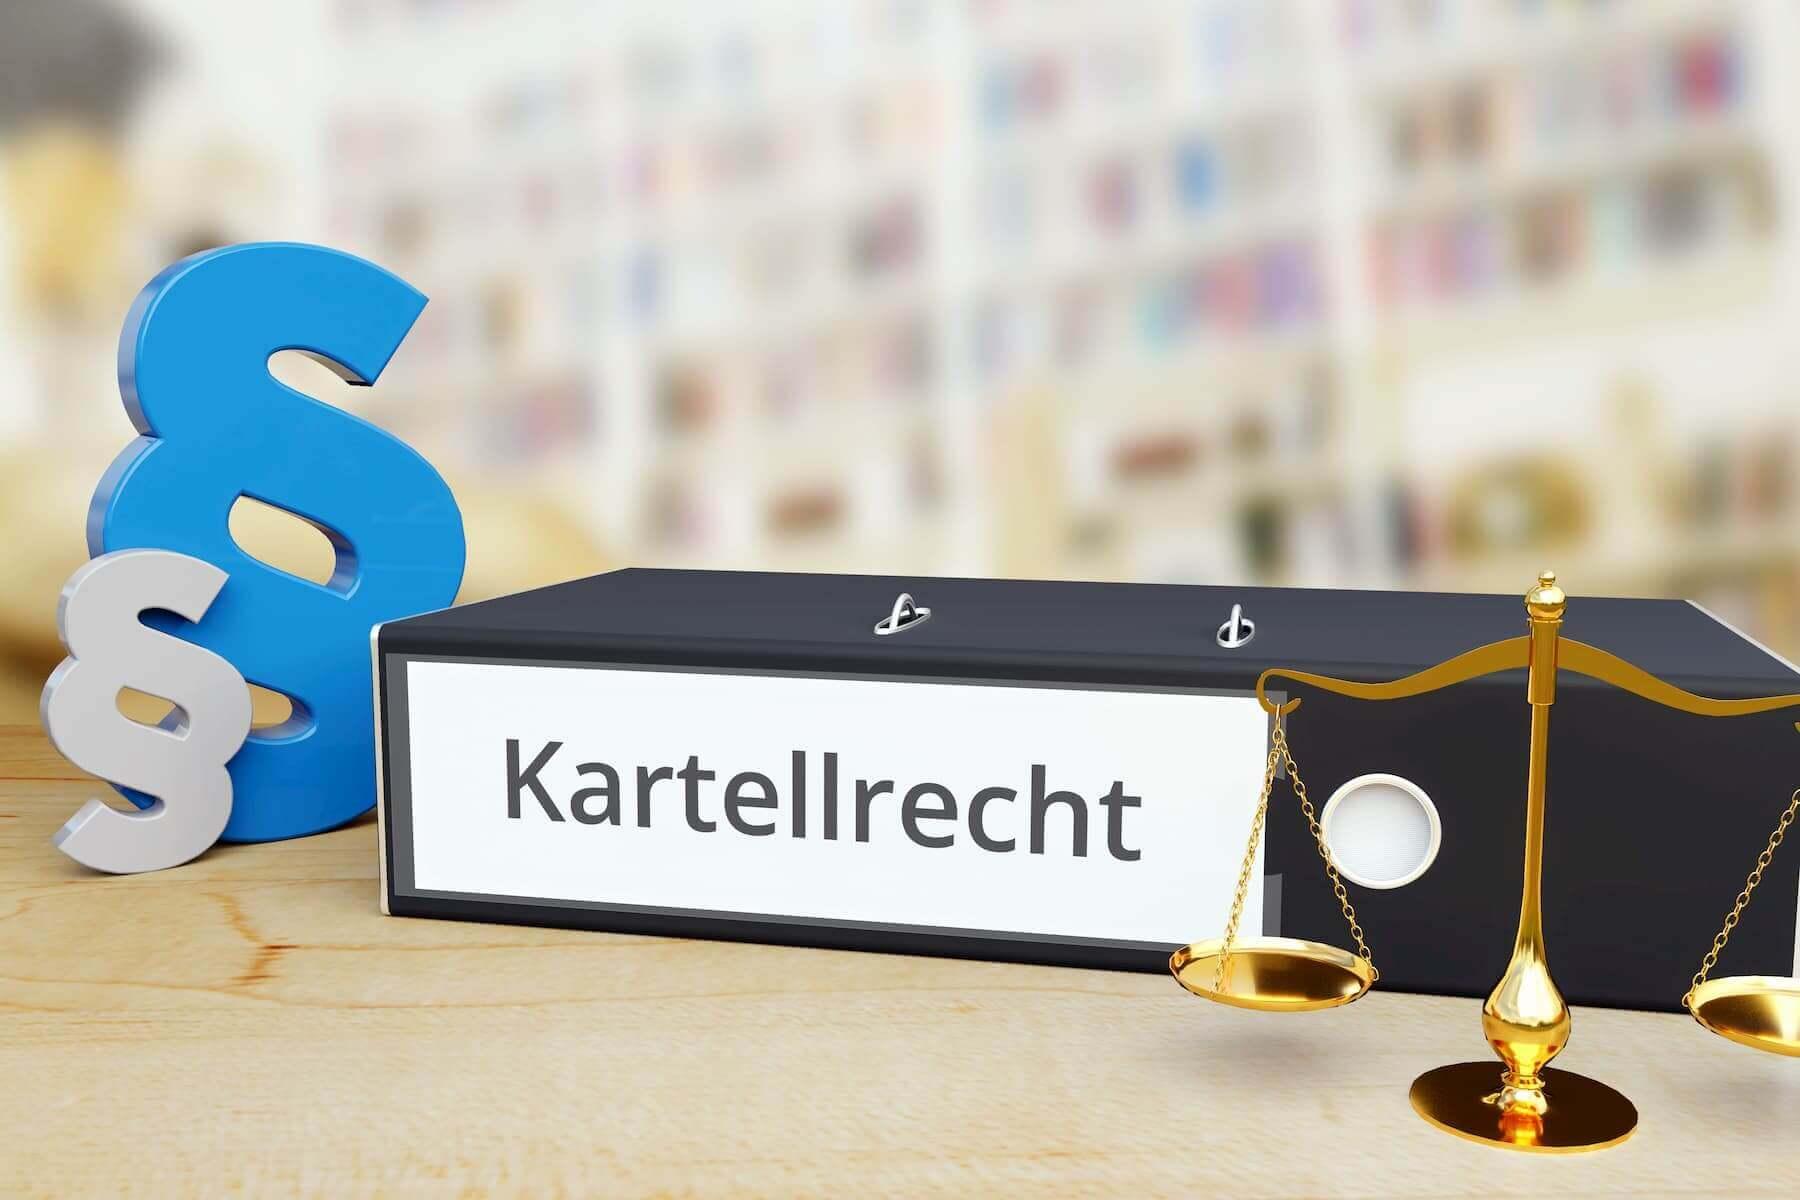 kartellrecht google monopol klage usa